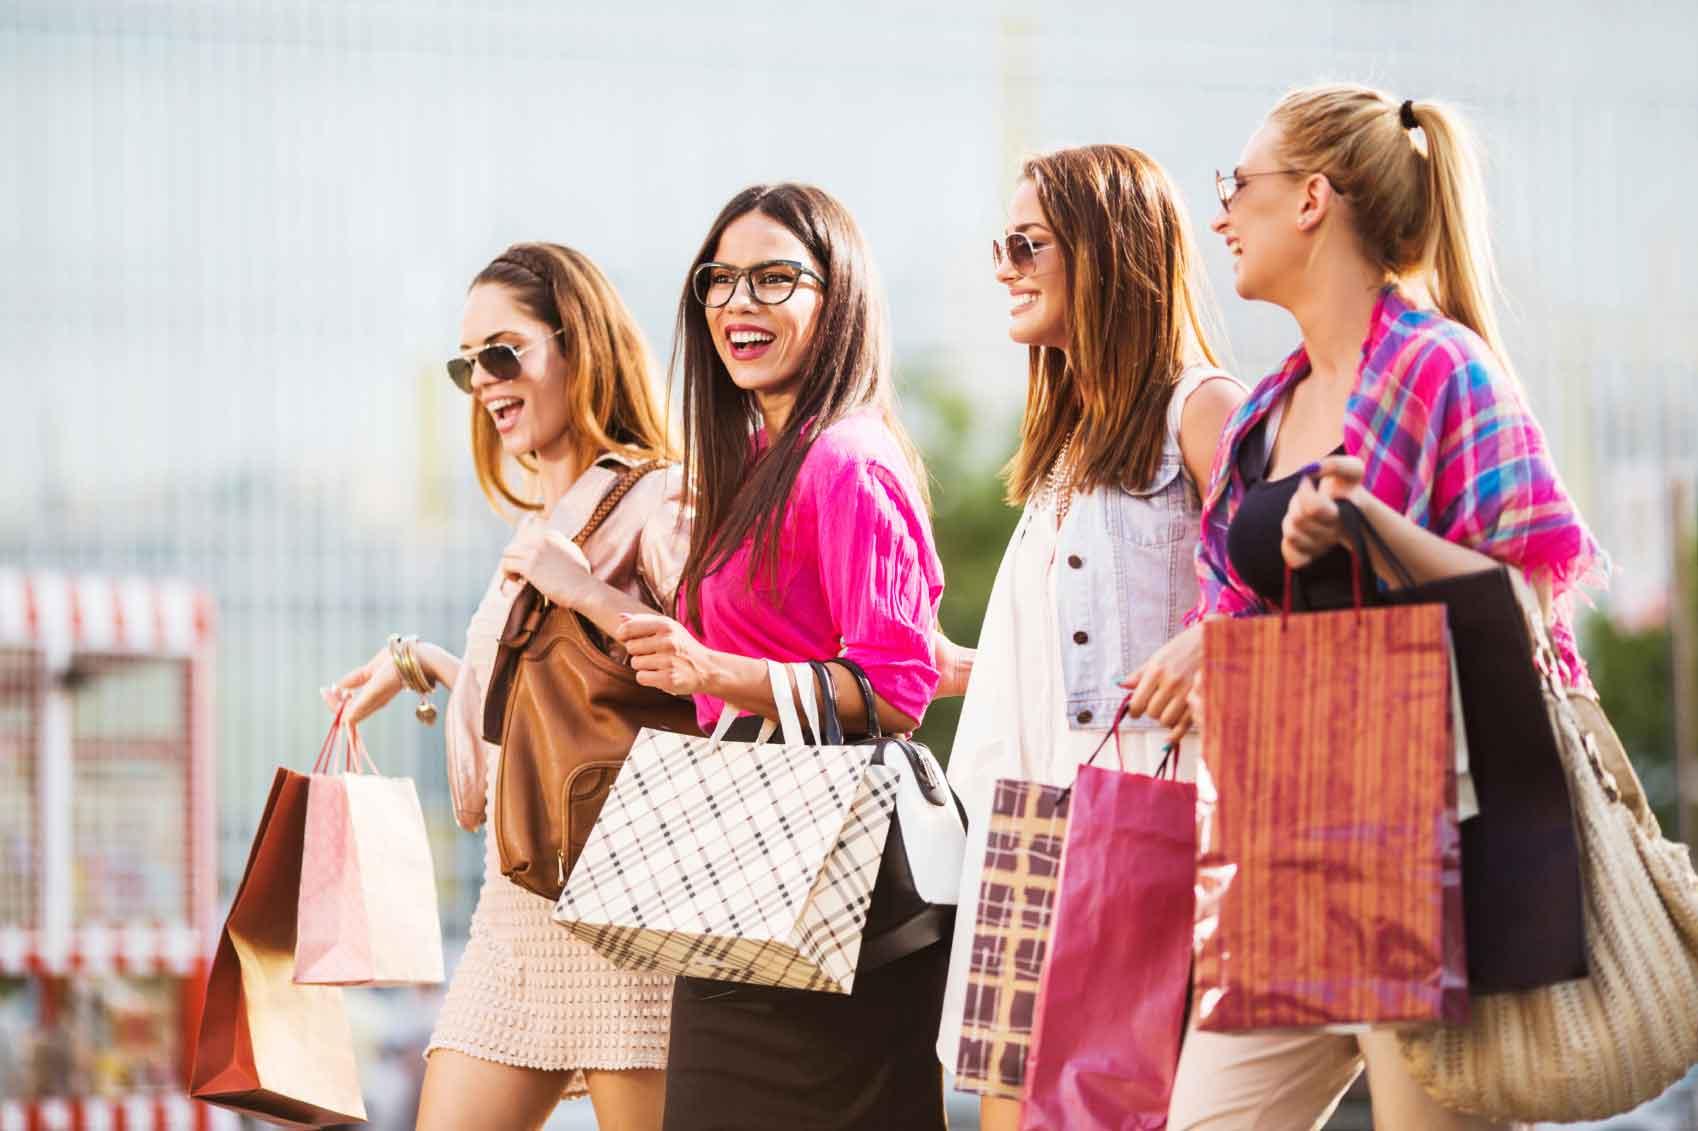 шоппинг картинка стильная нами